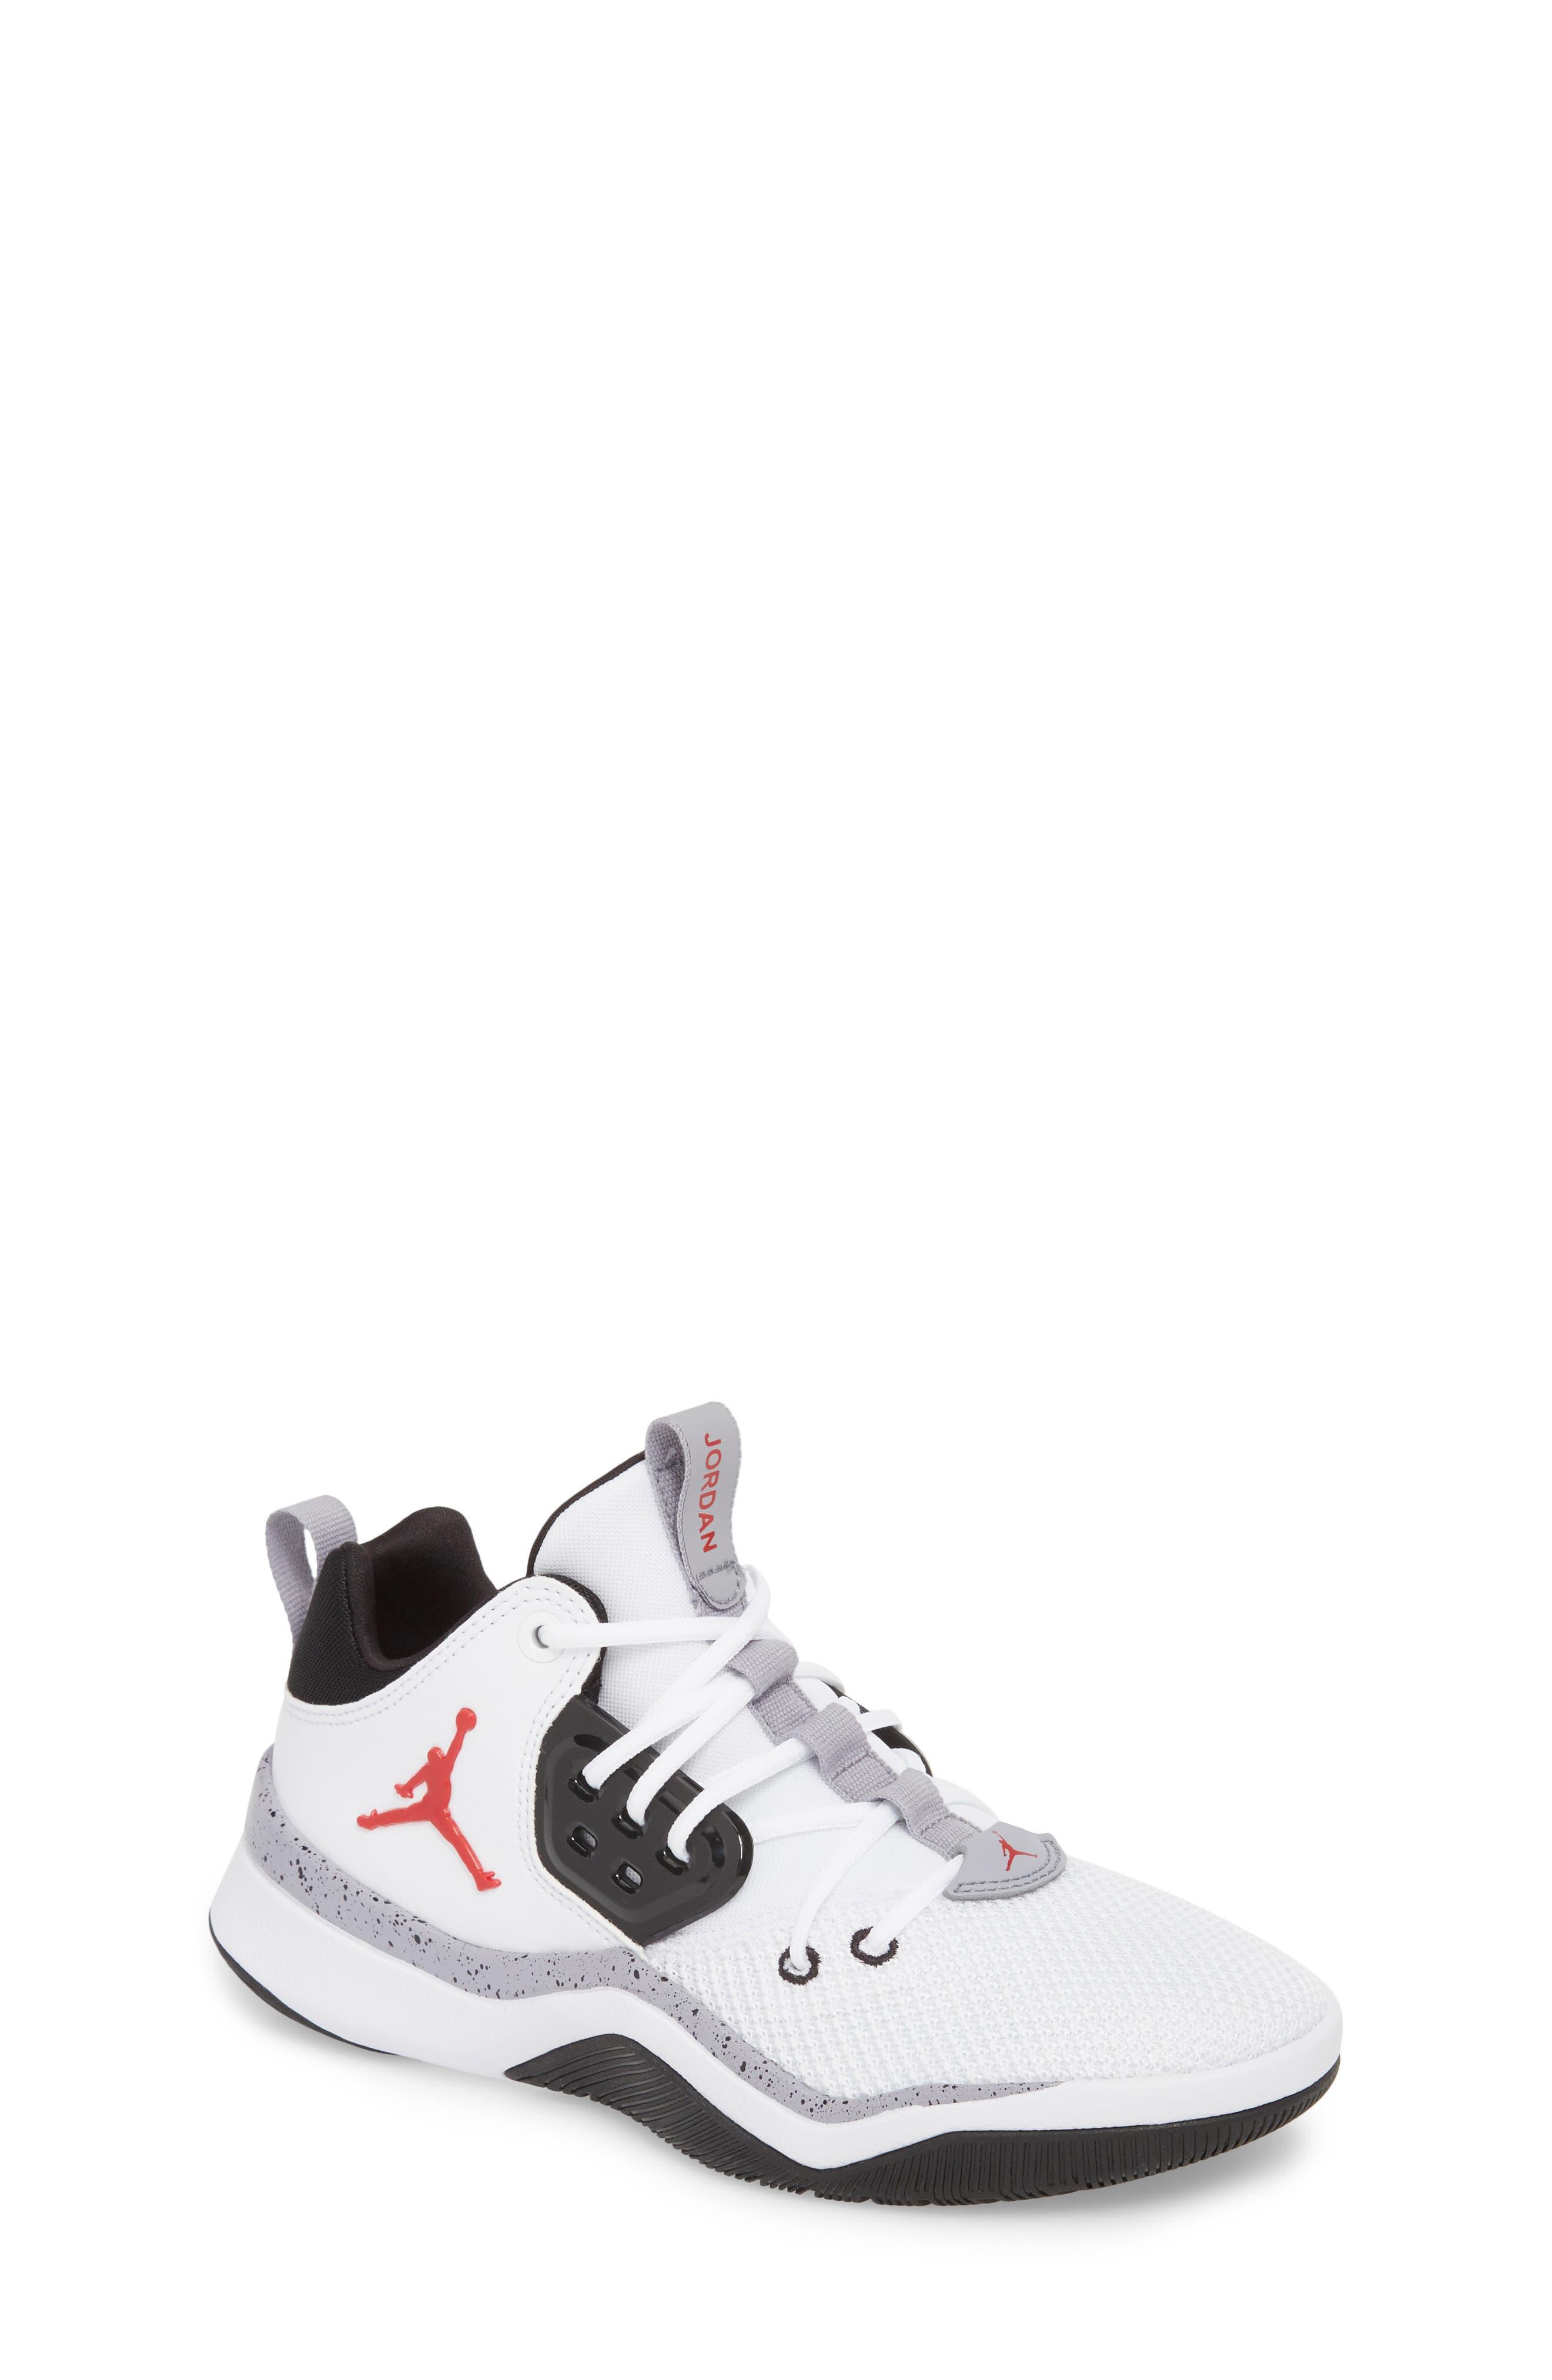 DNA Sneaker,                             Main thumbnail 1, color,                             103